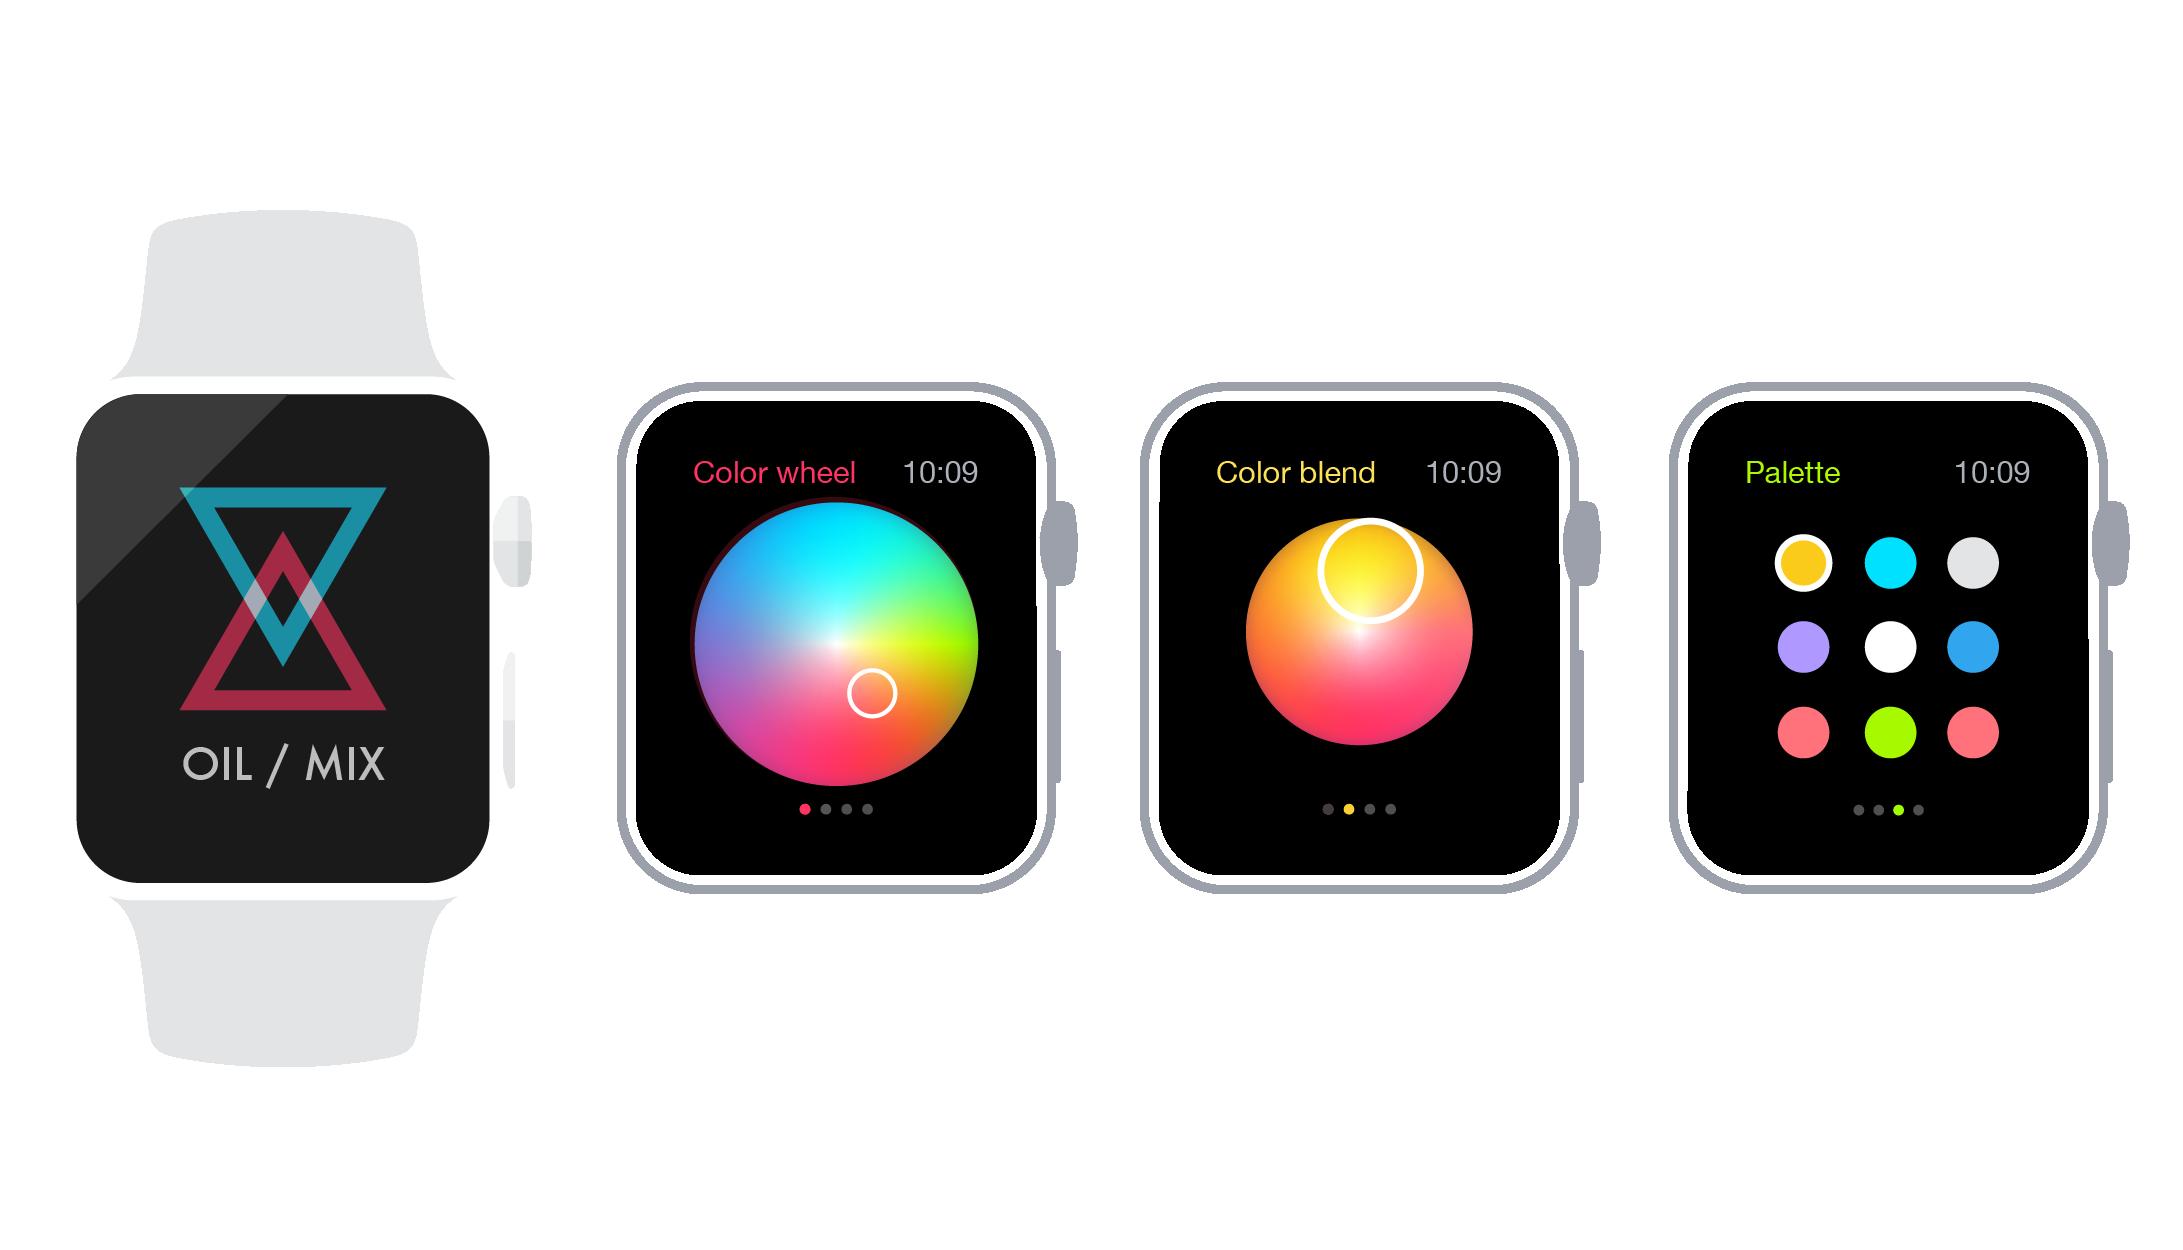 Apple Watch Application